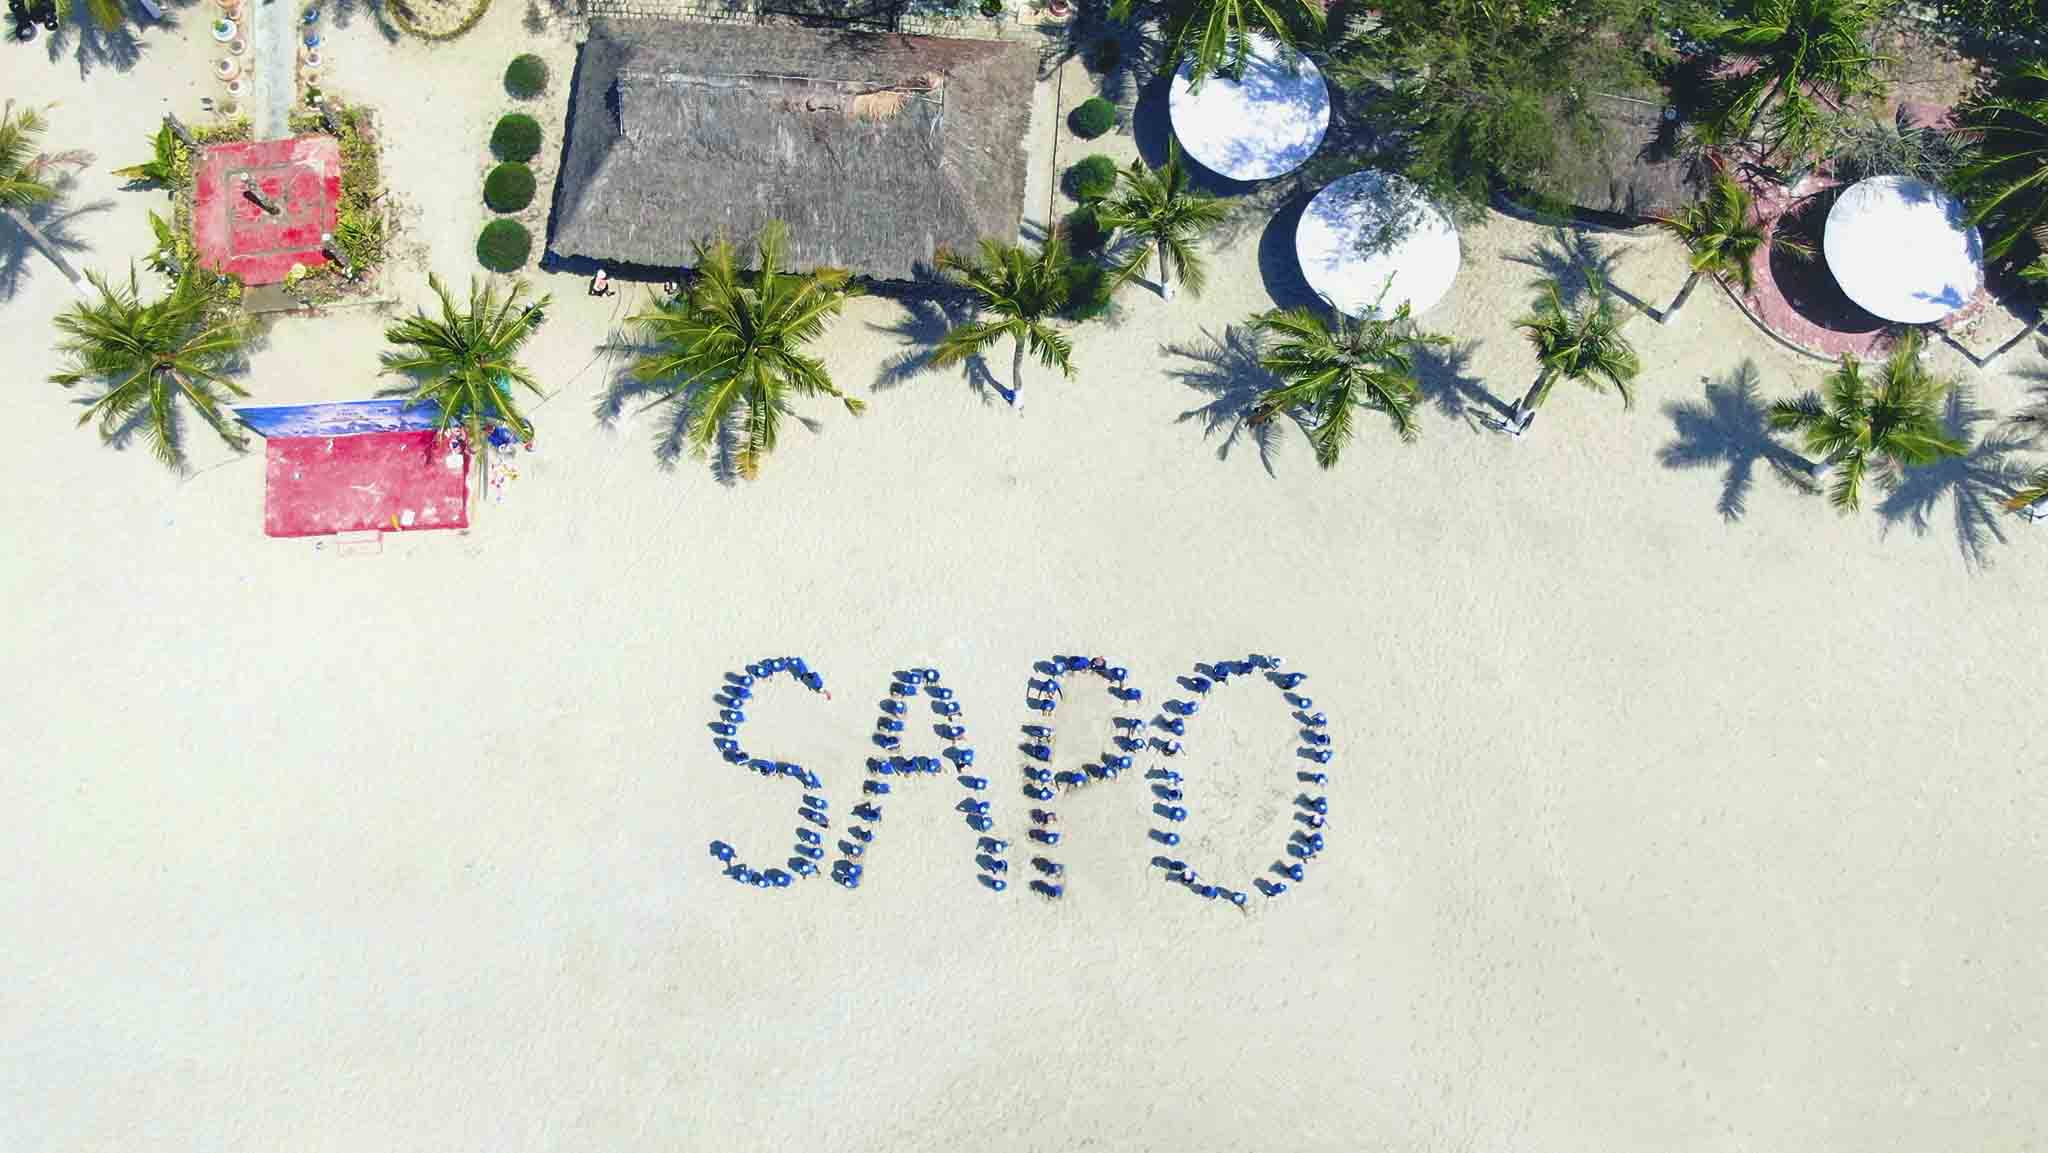 DU LỊCH HÈ SAPO 2020 - PHẦN 2: NHA TRANG